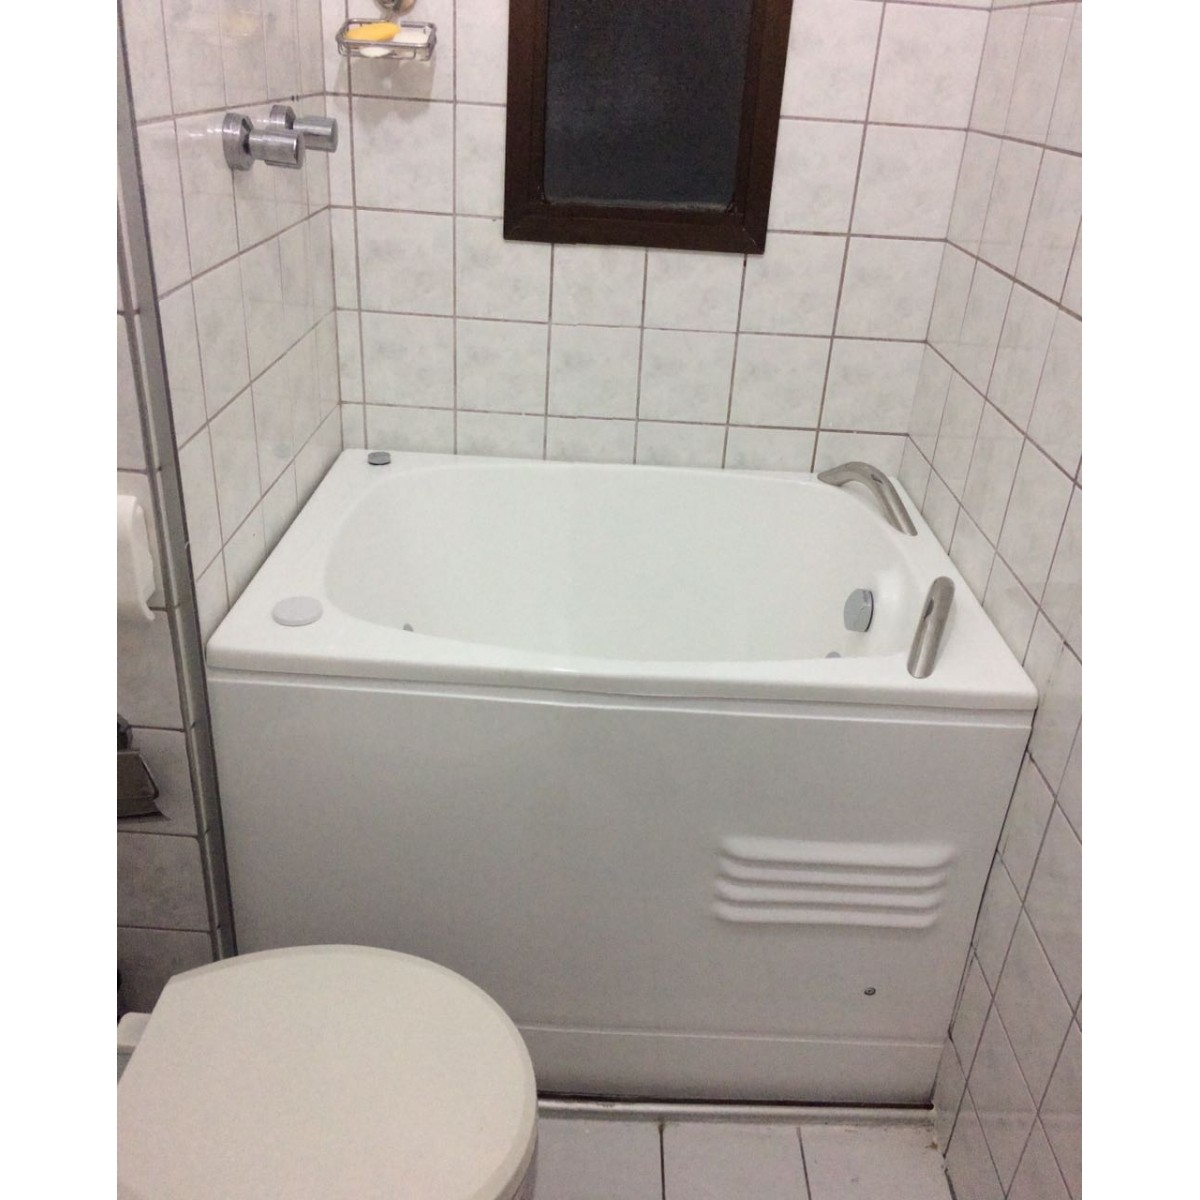 Banheira Apartamento Pequeno Mini Baby 0,98 x 0,70  - Hydromas